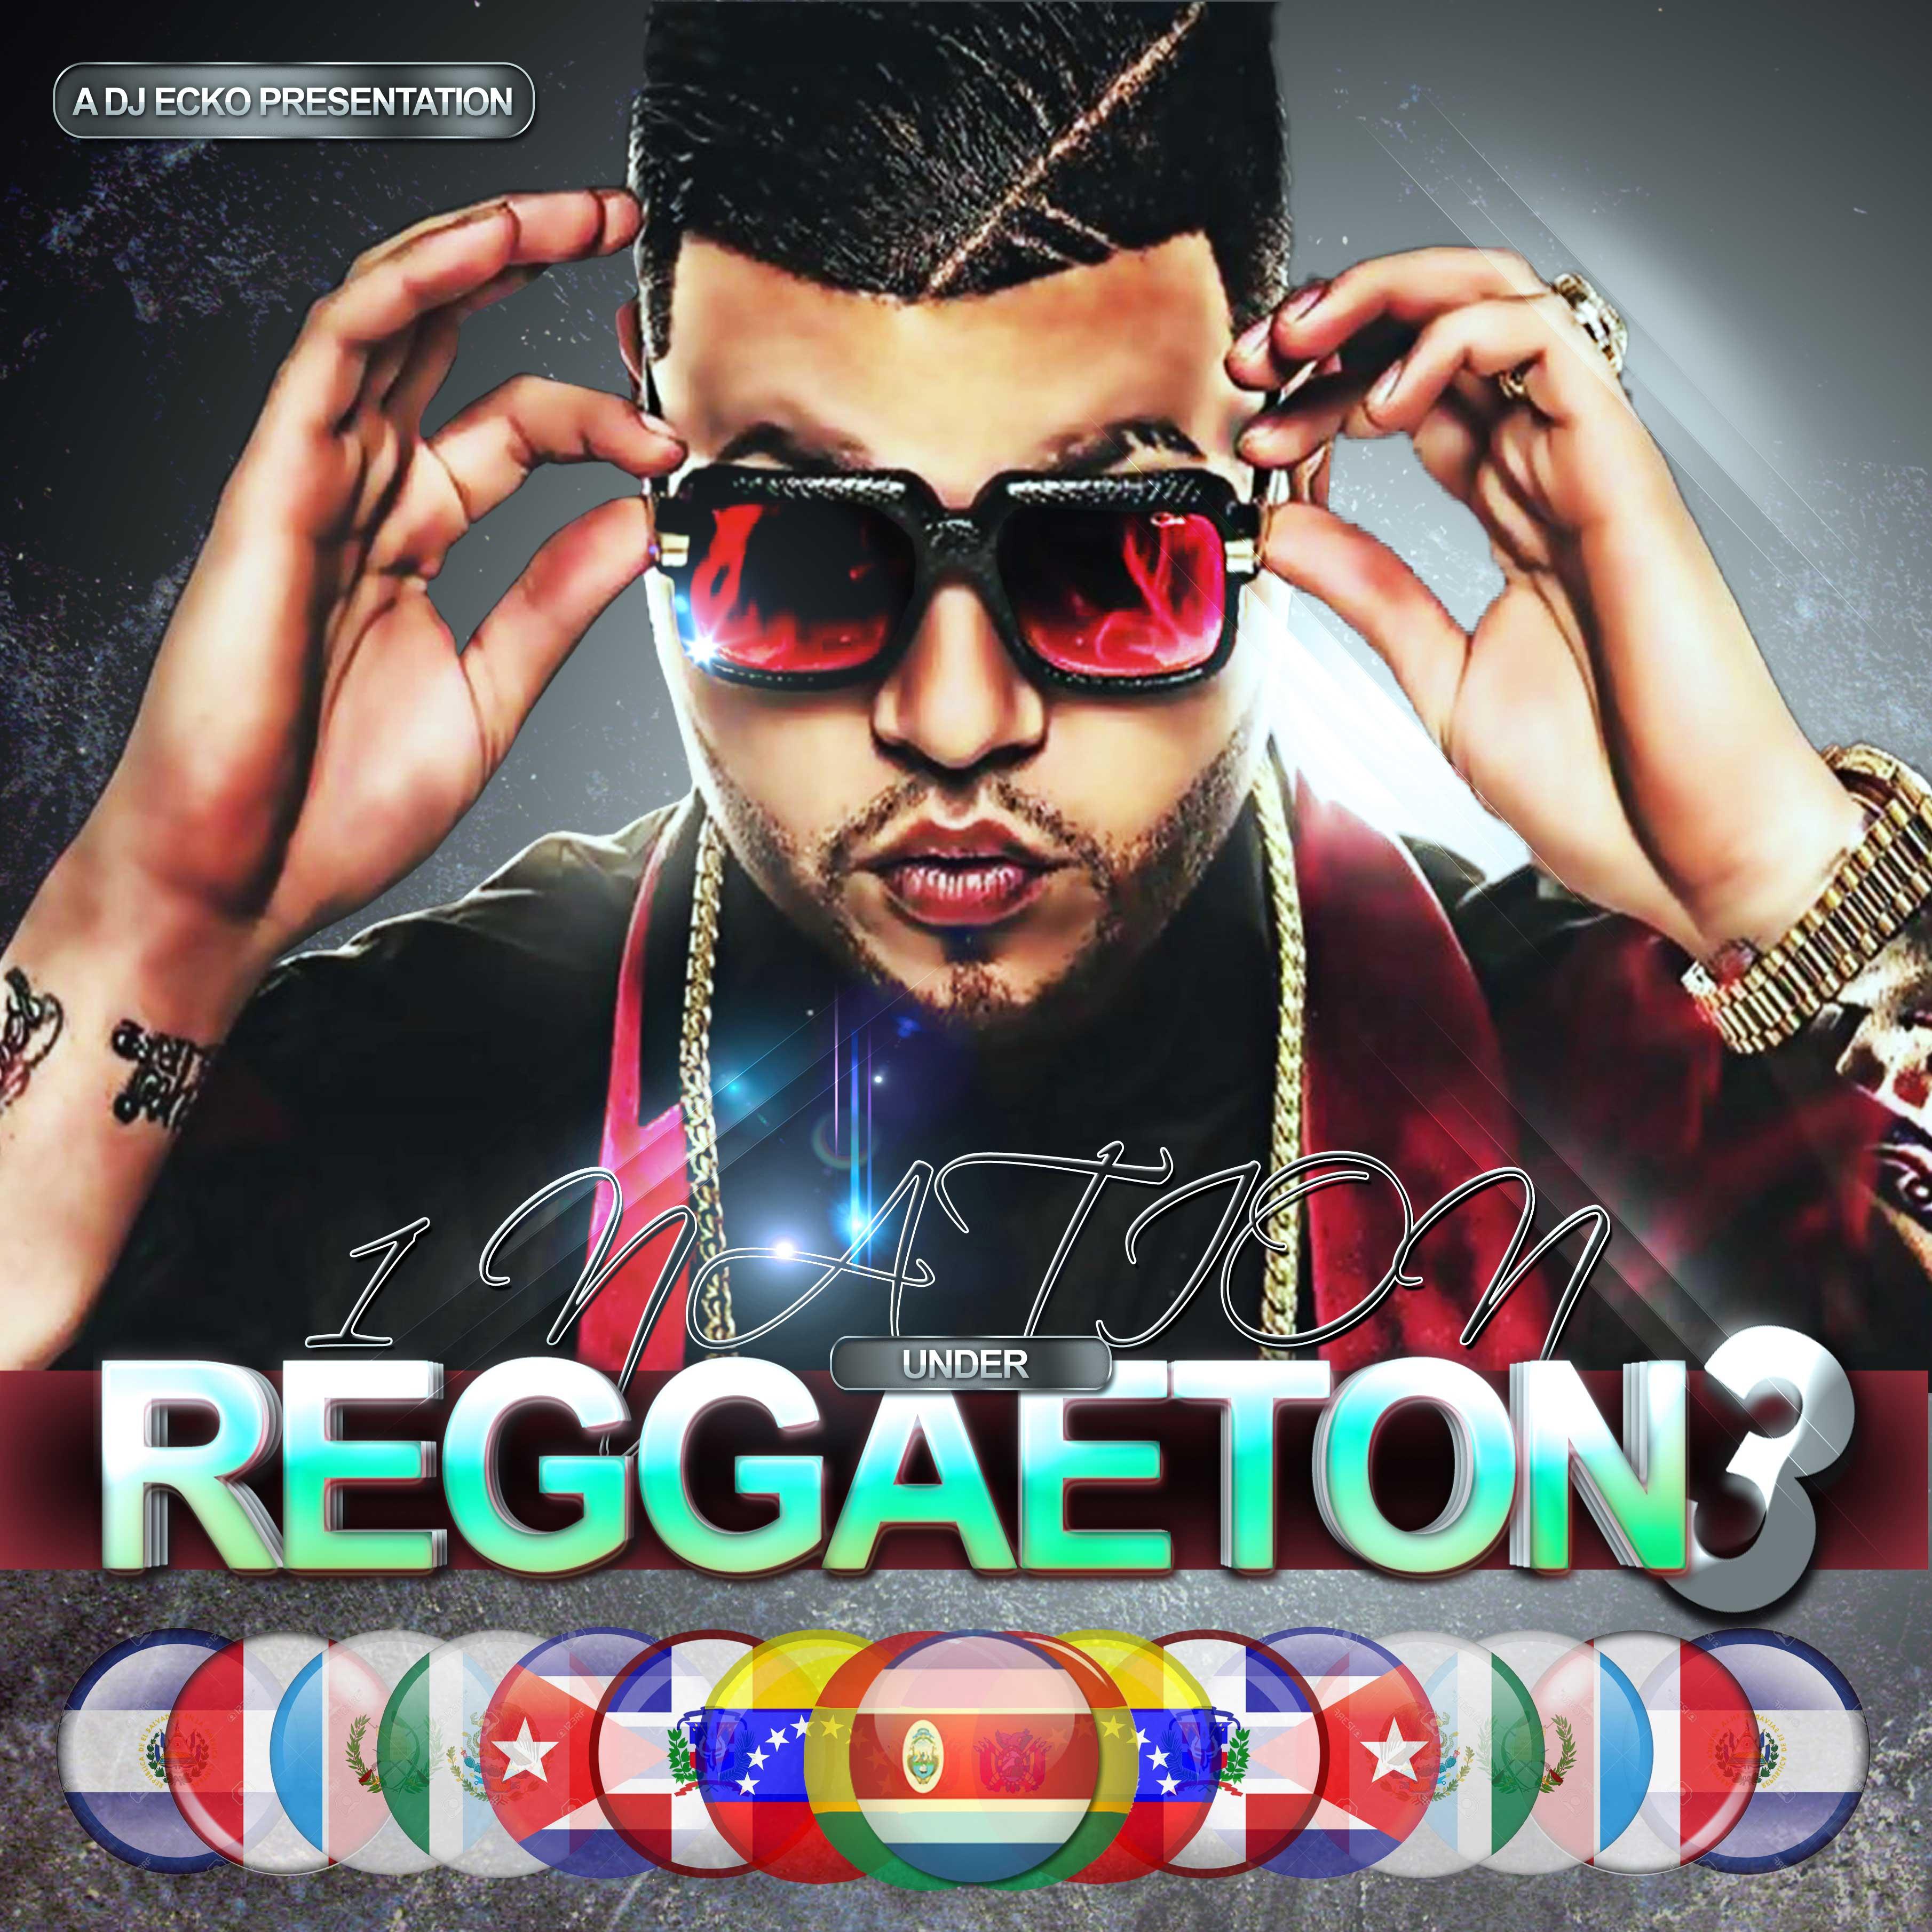 DJ Ecko - 1 Nation Under Reggaeton 3 | Buymixtapes com